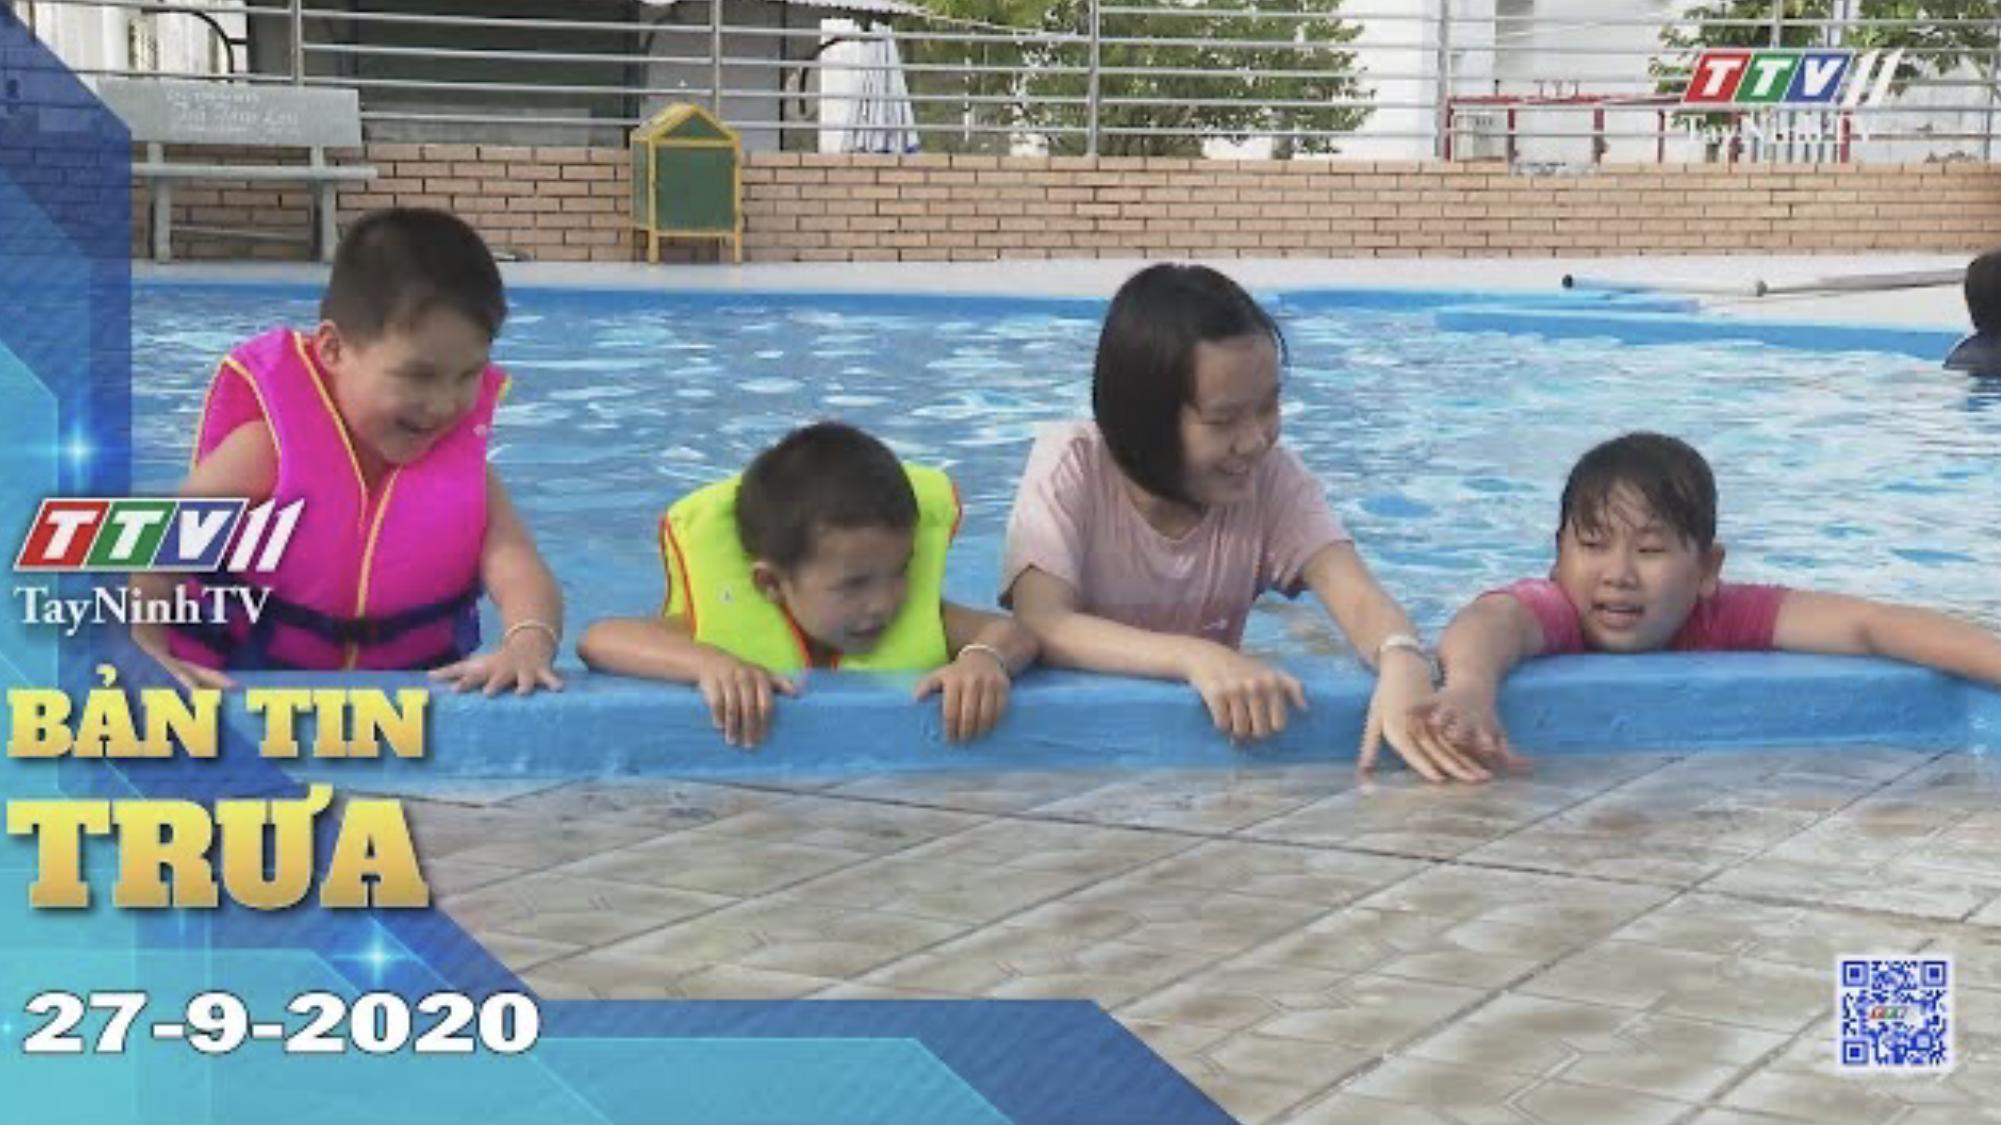 Bản tin trưa 27-9-2020 | Tin tức hôm nay | TayNinhTV